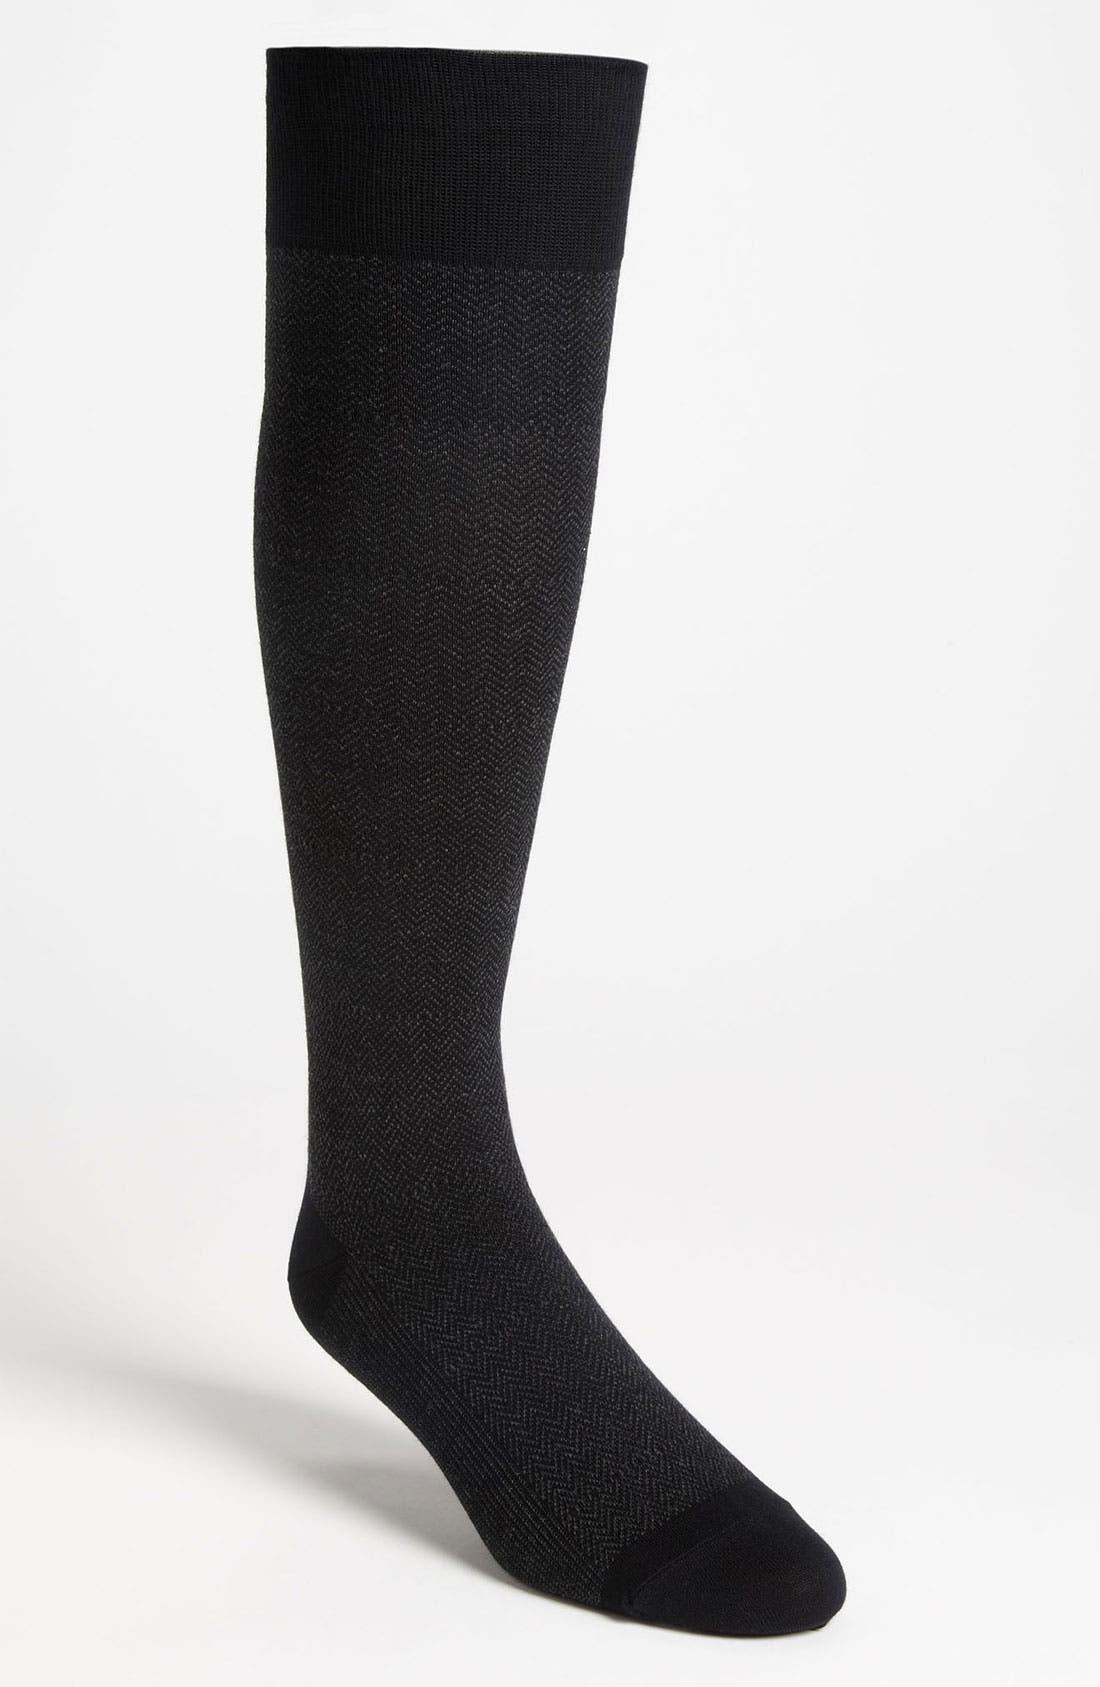 Main Image - Polo Ralph Lauren Over the Calf Socks